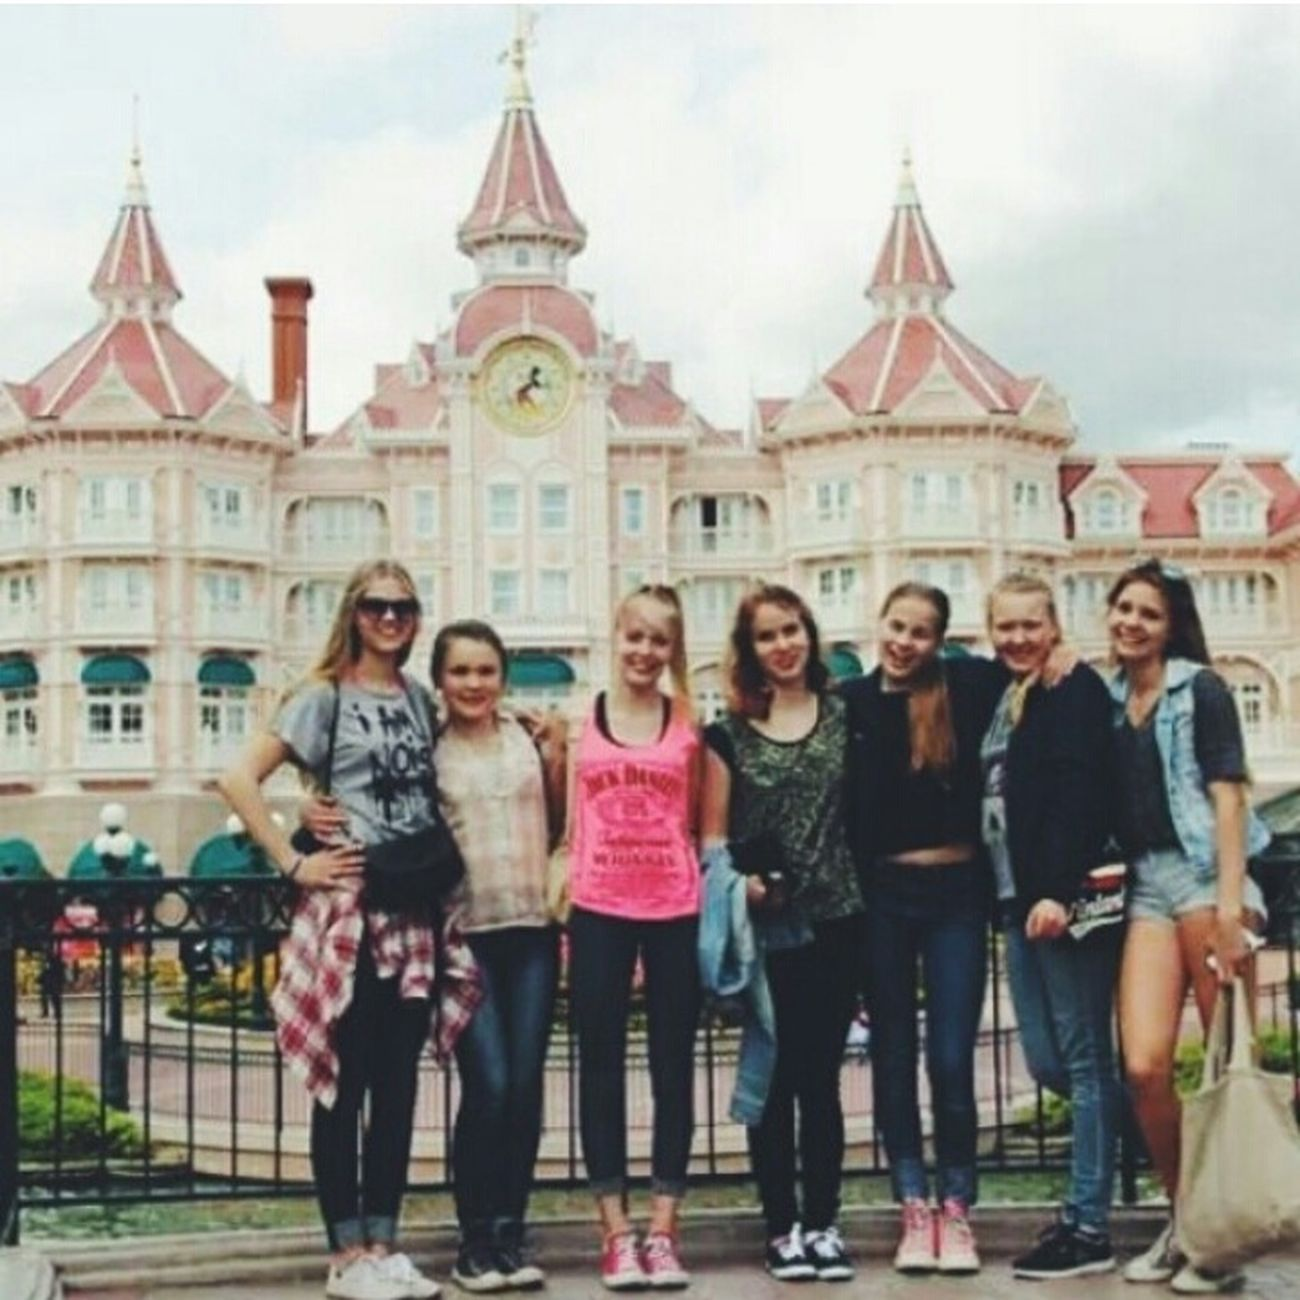 Disneyland- where dreams come true ❤ Enjoying Life